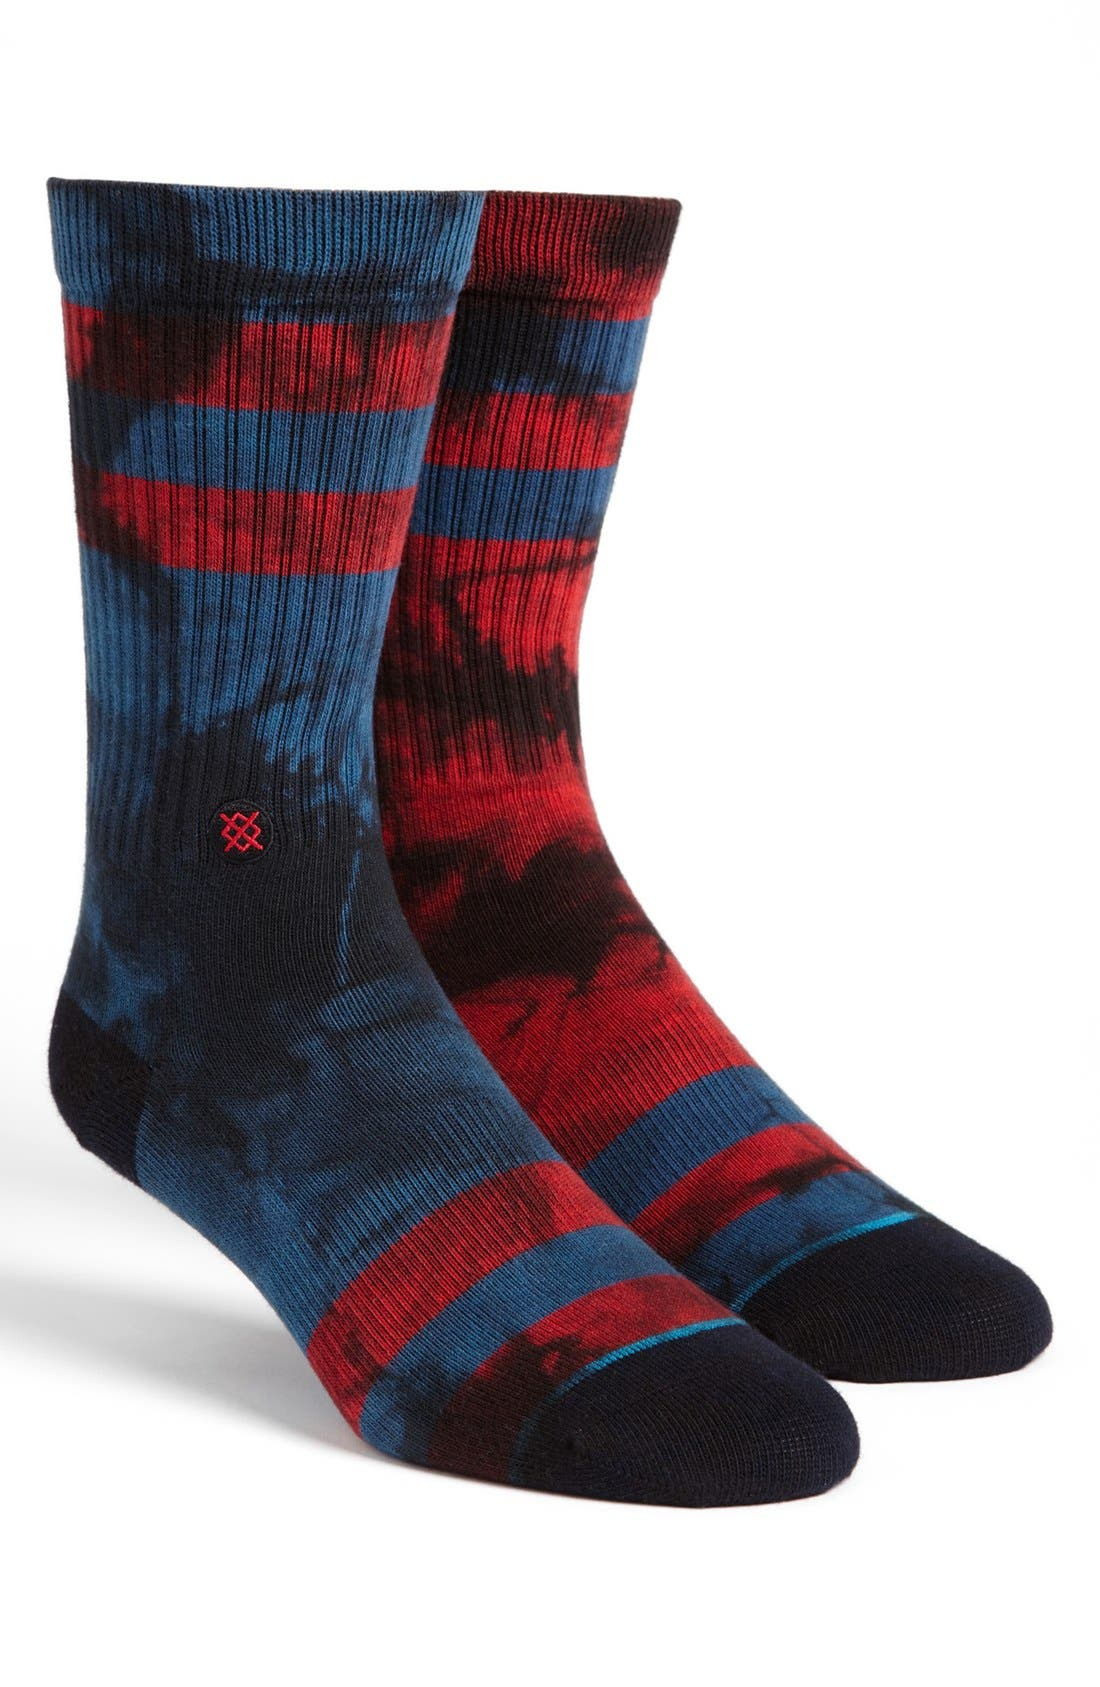 Alternate Image 1 Selected - Stance 'Invert' Rib Crew Socks